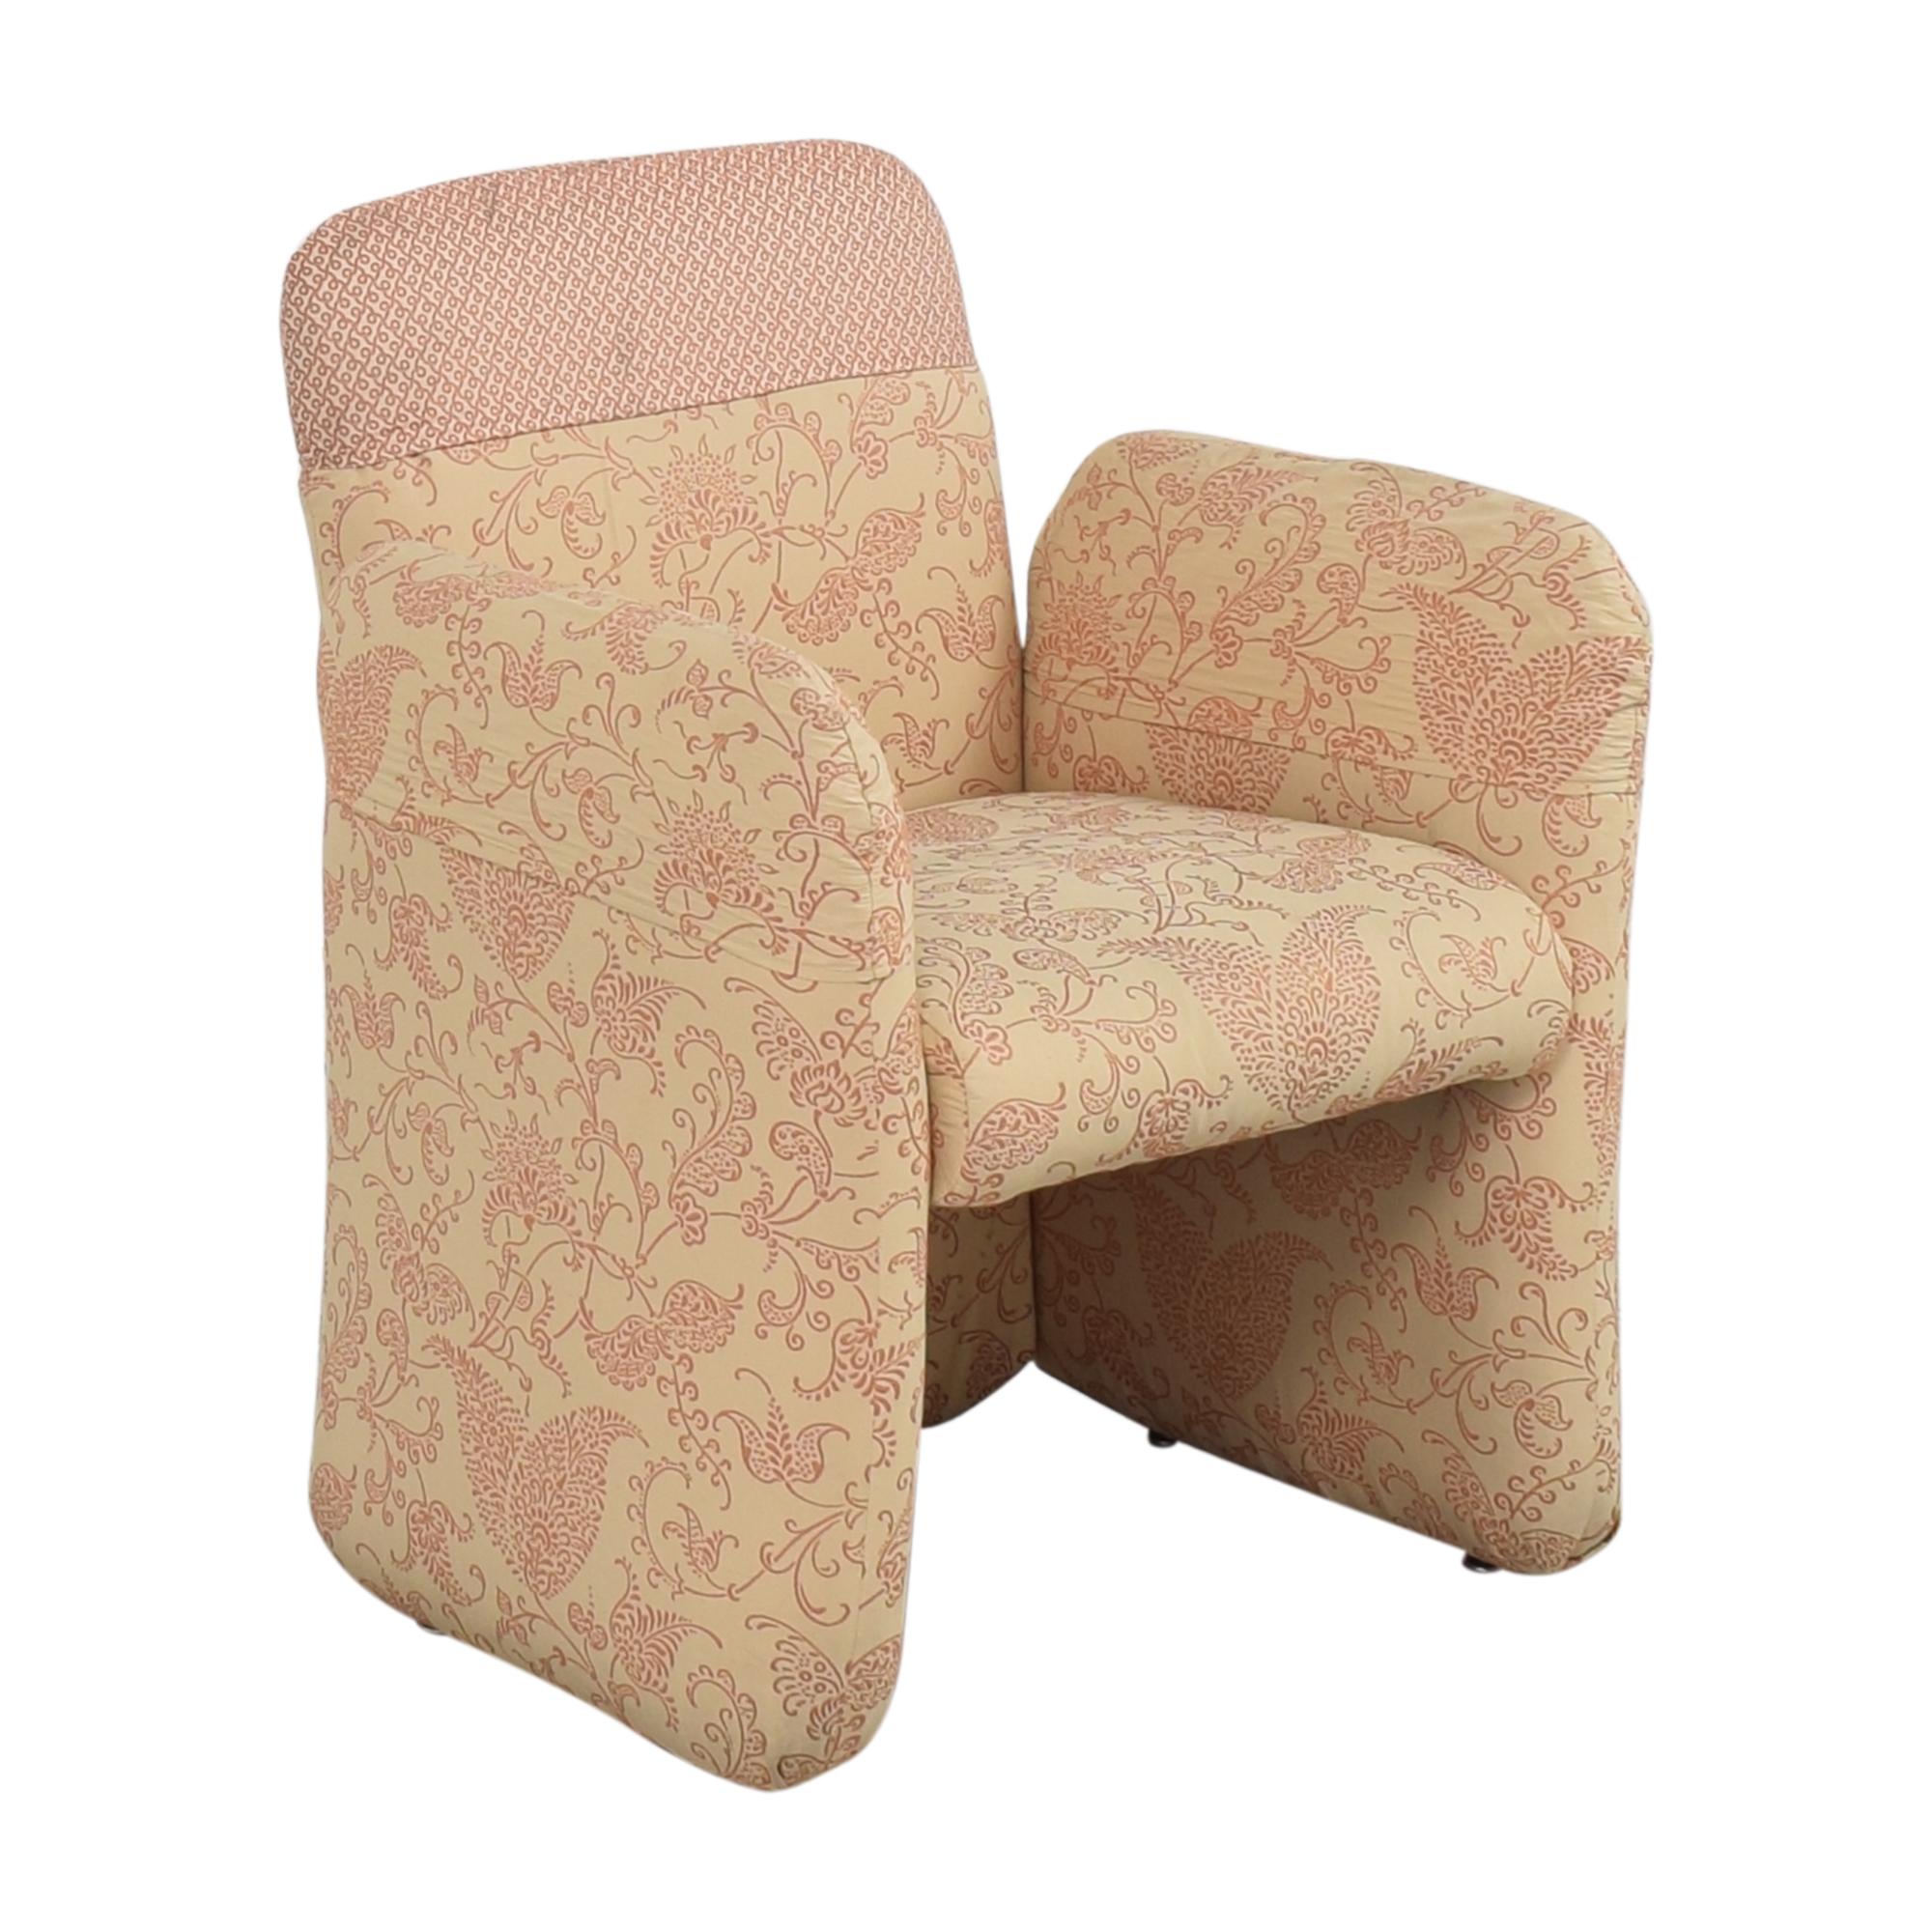 Bloomingdale's Bloomingdale's Milo Baughman-Style Club Chair second hand